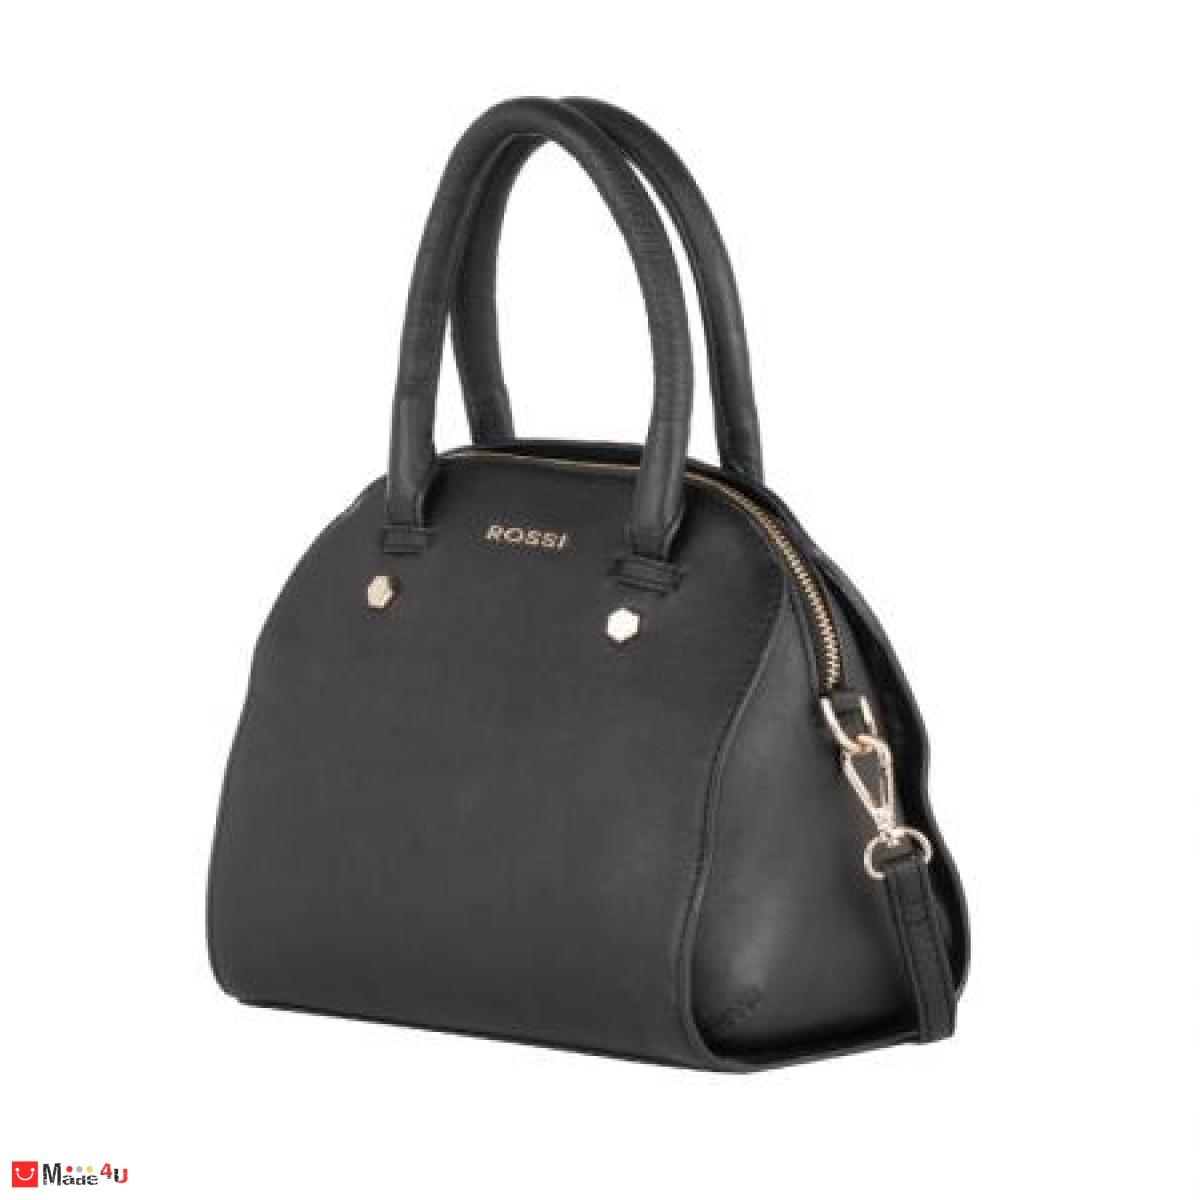 Дамска чанта естествена кожа 21х25см, черна